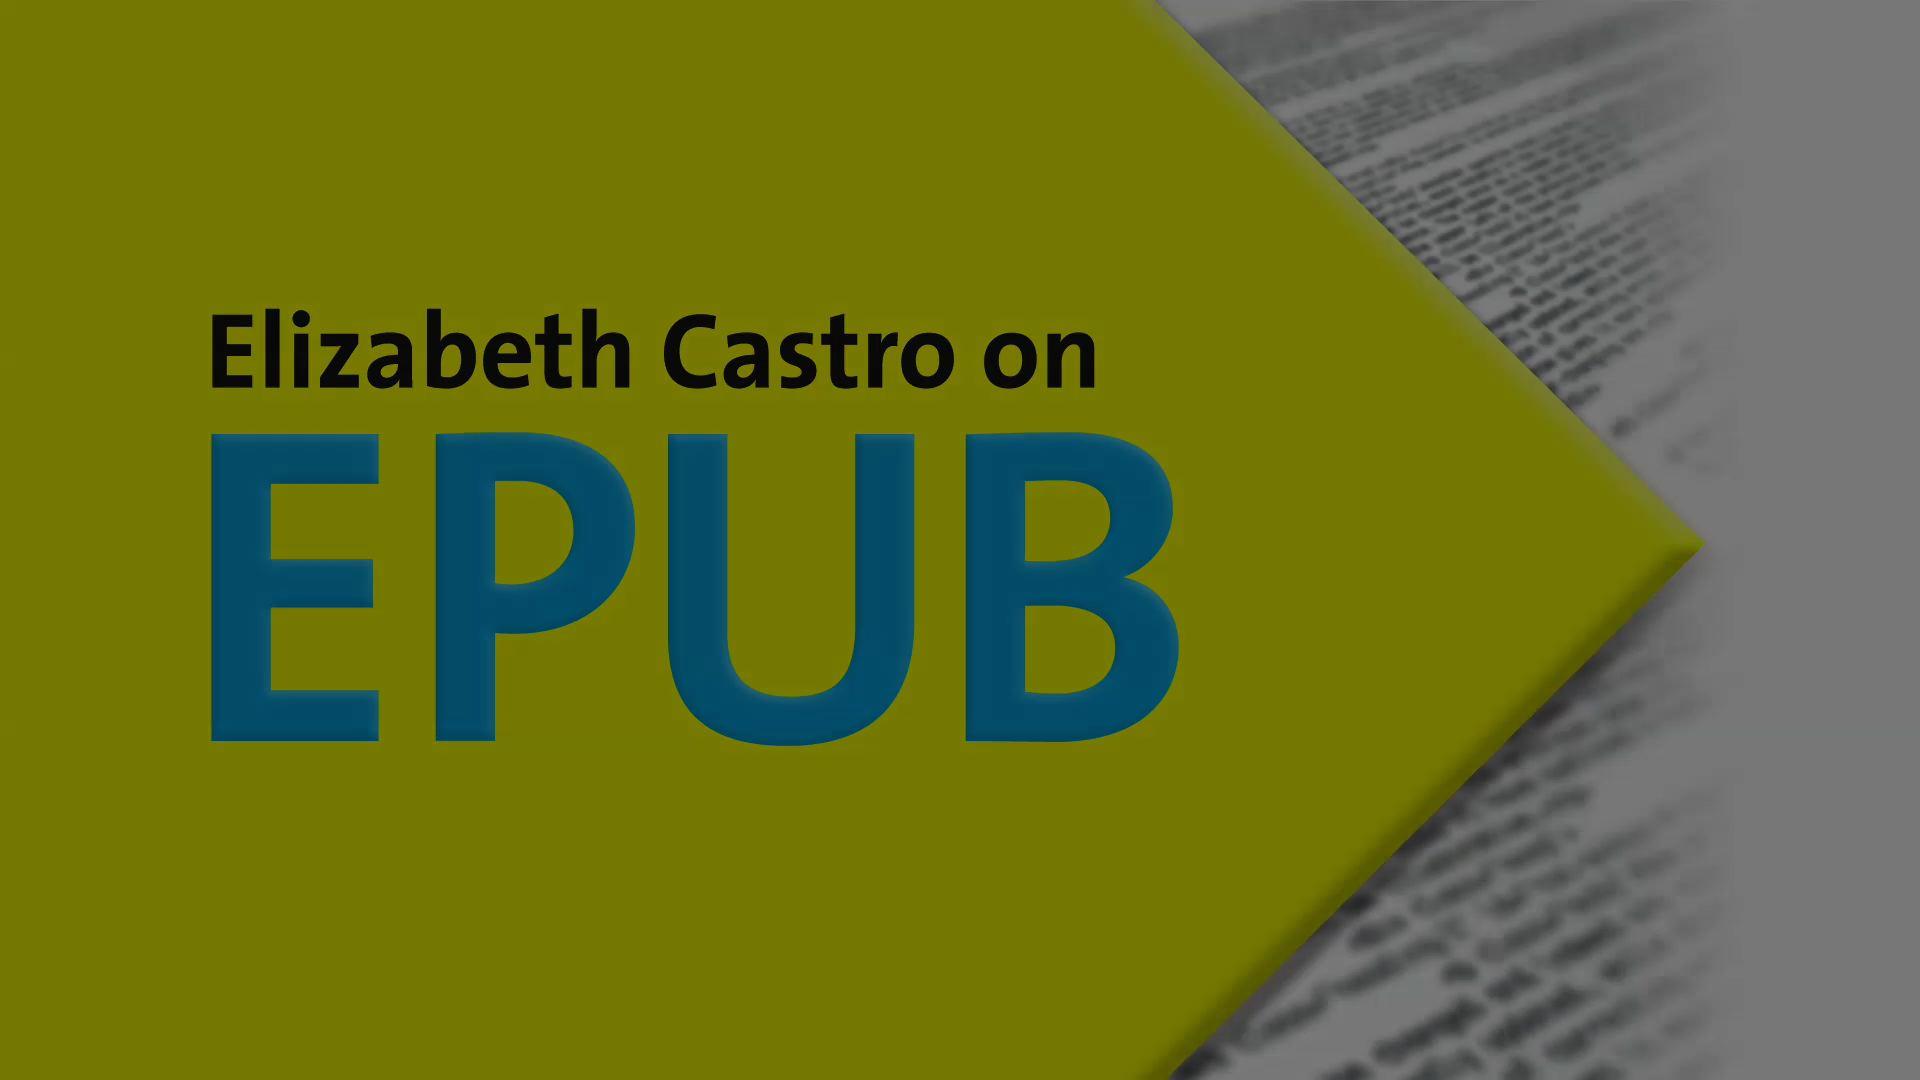 Elizabeth Castro on EPUB